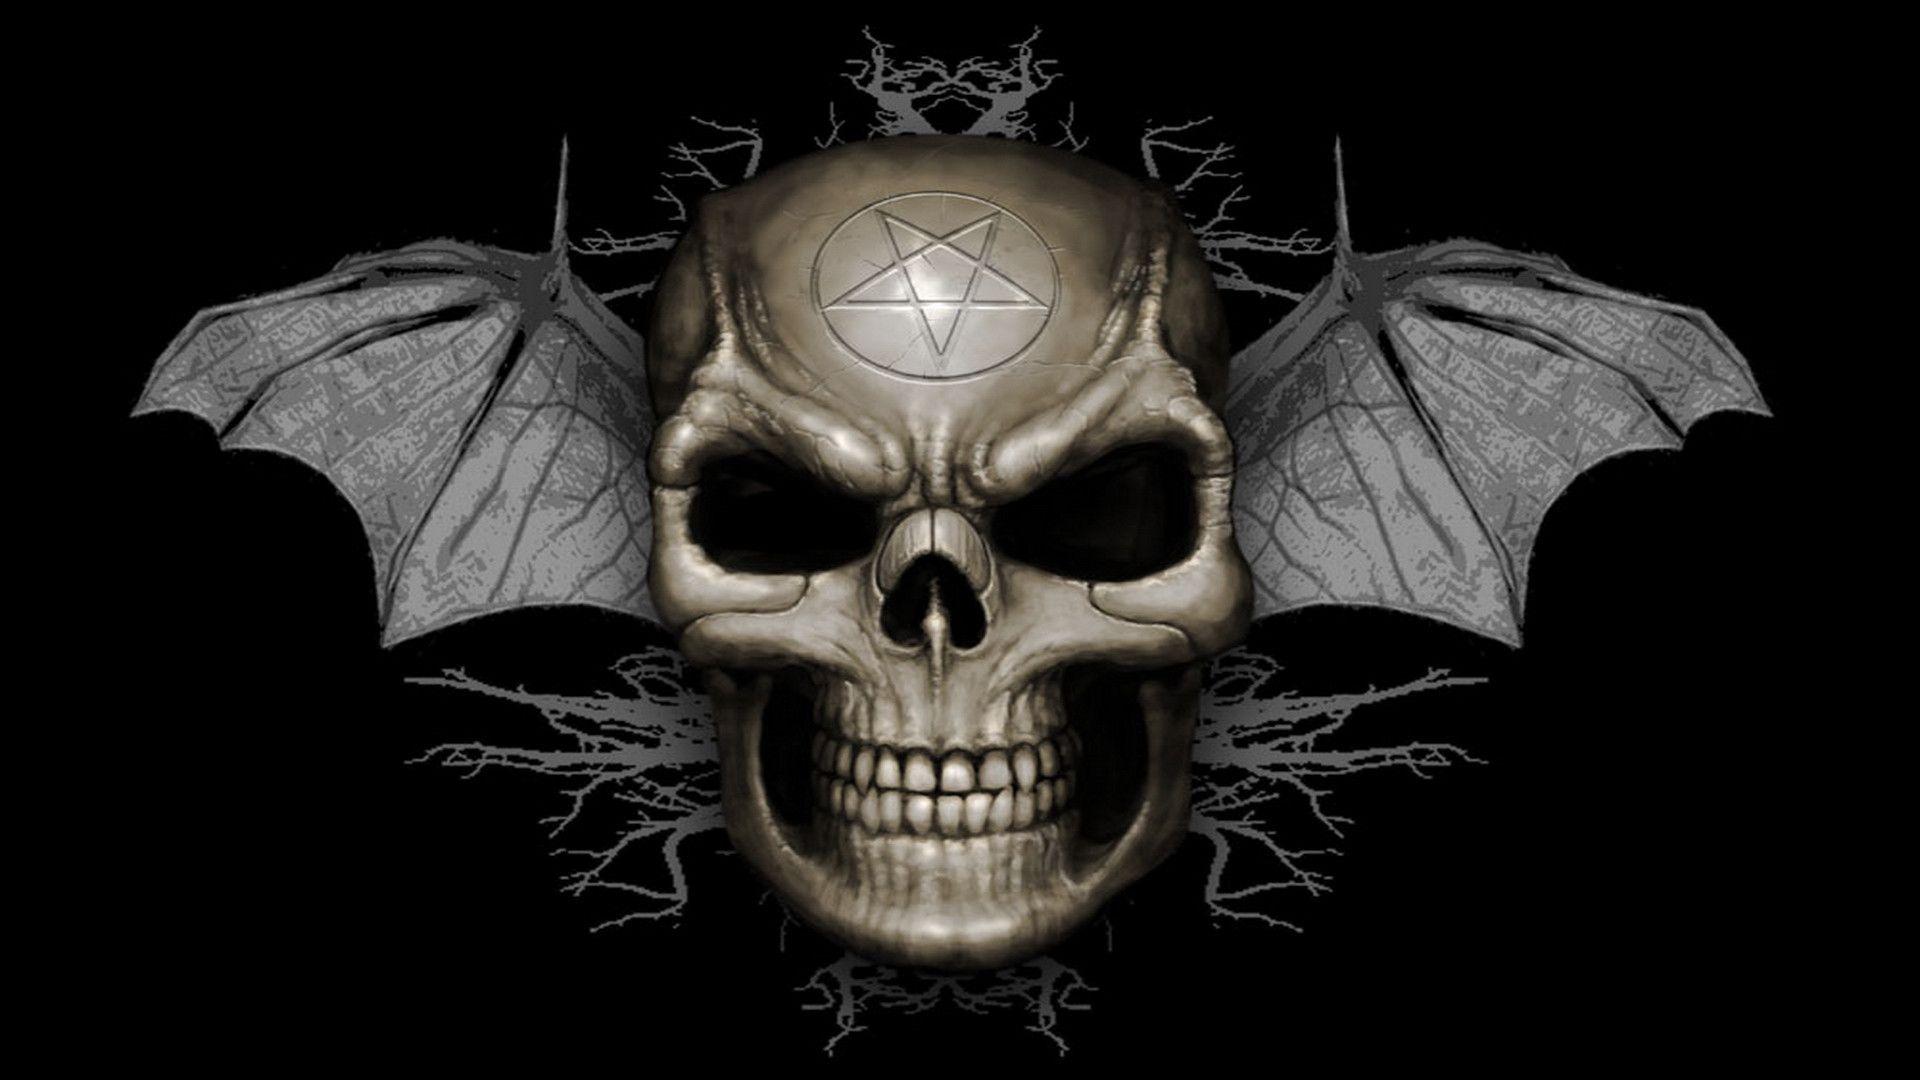 HD Skull Wallpapers - Wallpaper Cave